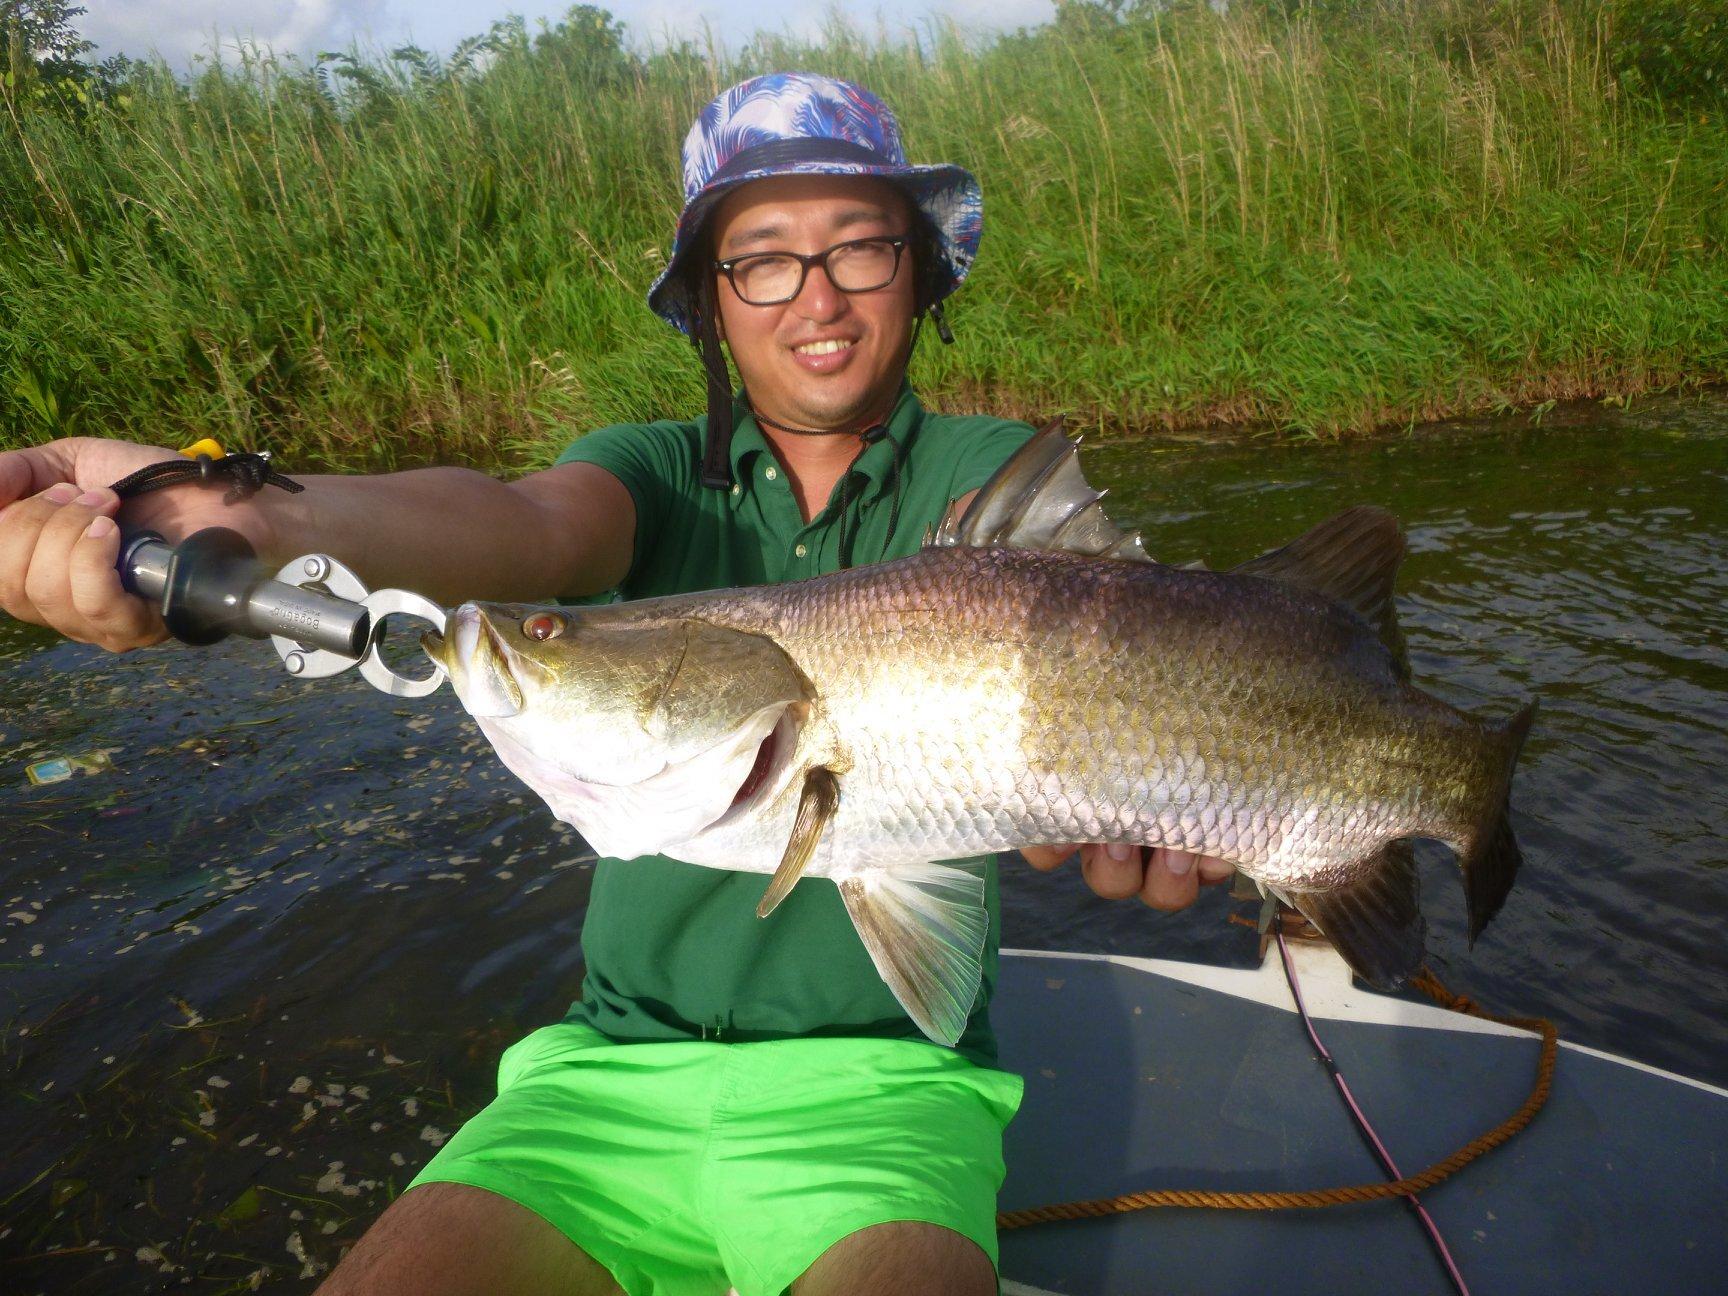 Fishing lure sri lanka.jpg